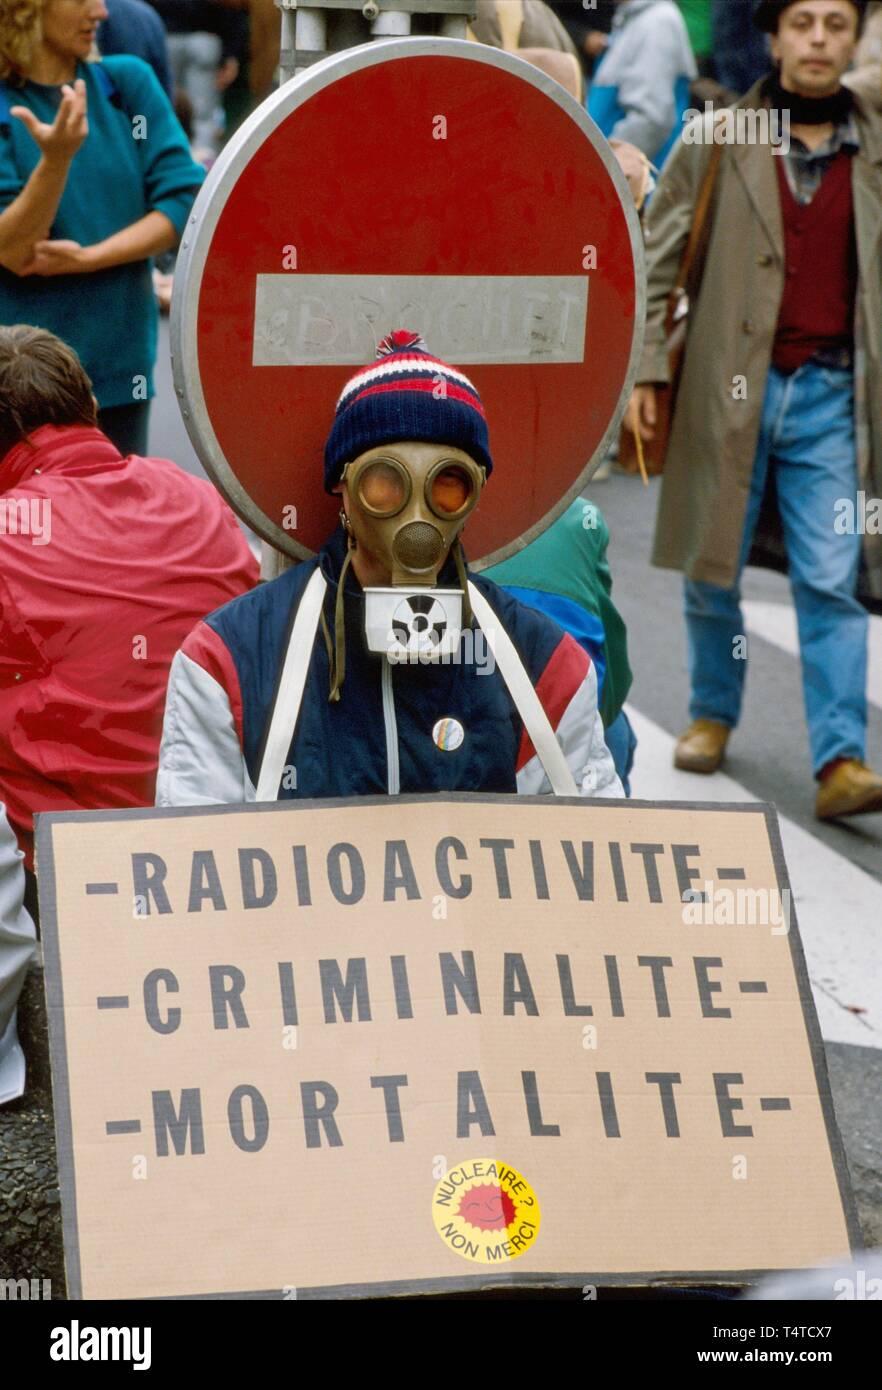 Manifestación antinuclear en París, Francia, junio de 1987 Imagen De Stock